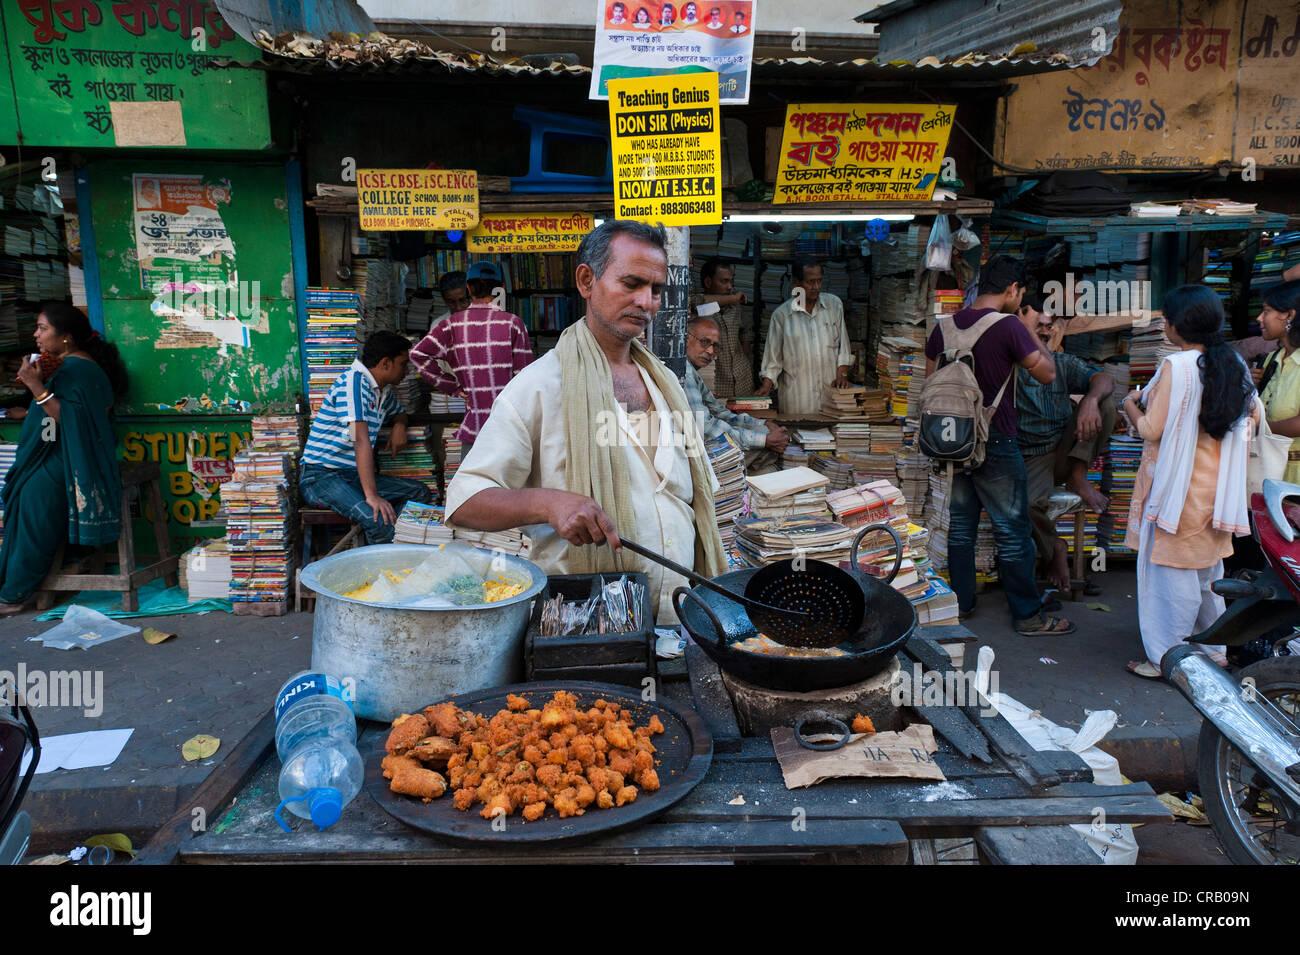 Street vendors and the book market, College Street, Kolkata, Calcutta, West Bengal, India - Stock Image